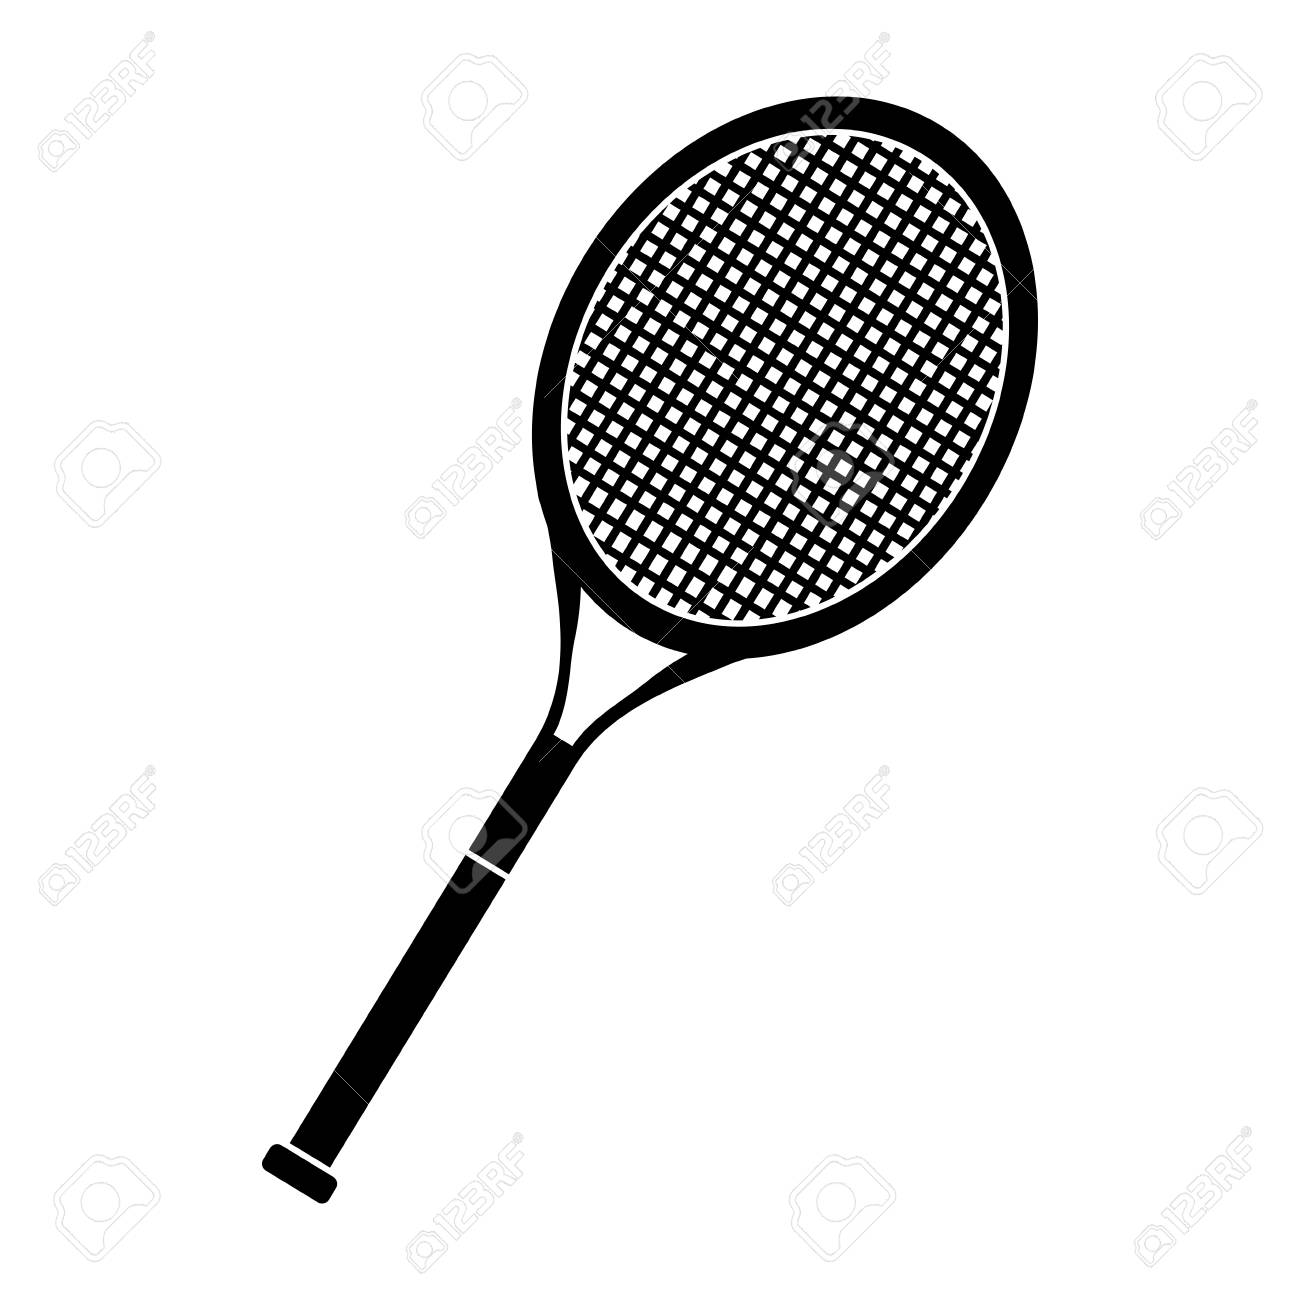 Tennis Racket Icon Vector Illustration Graphic Design Royalty Free